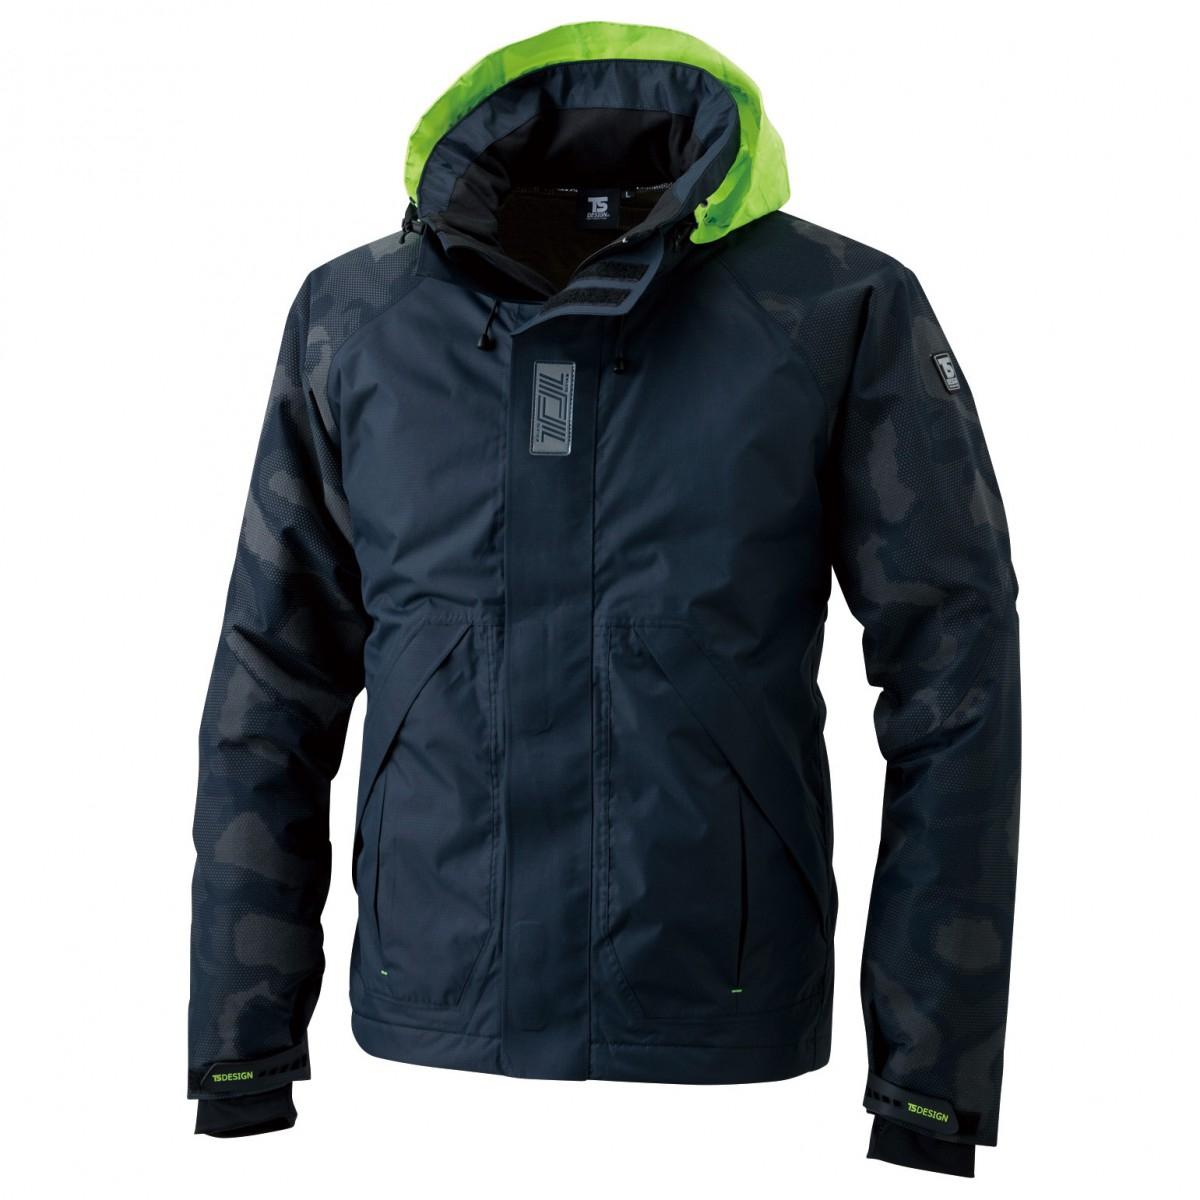 TS DESIGN  18236 メガヒートフラッシュ防水防寒ジャケット 45 ネイビー